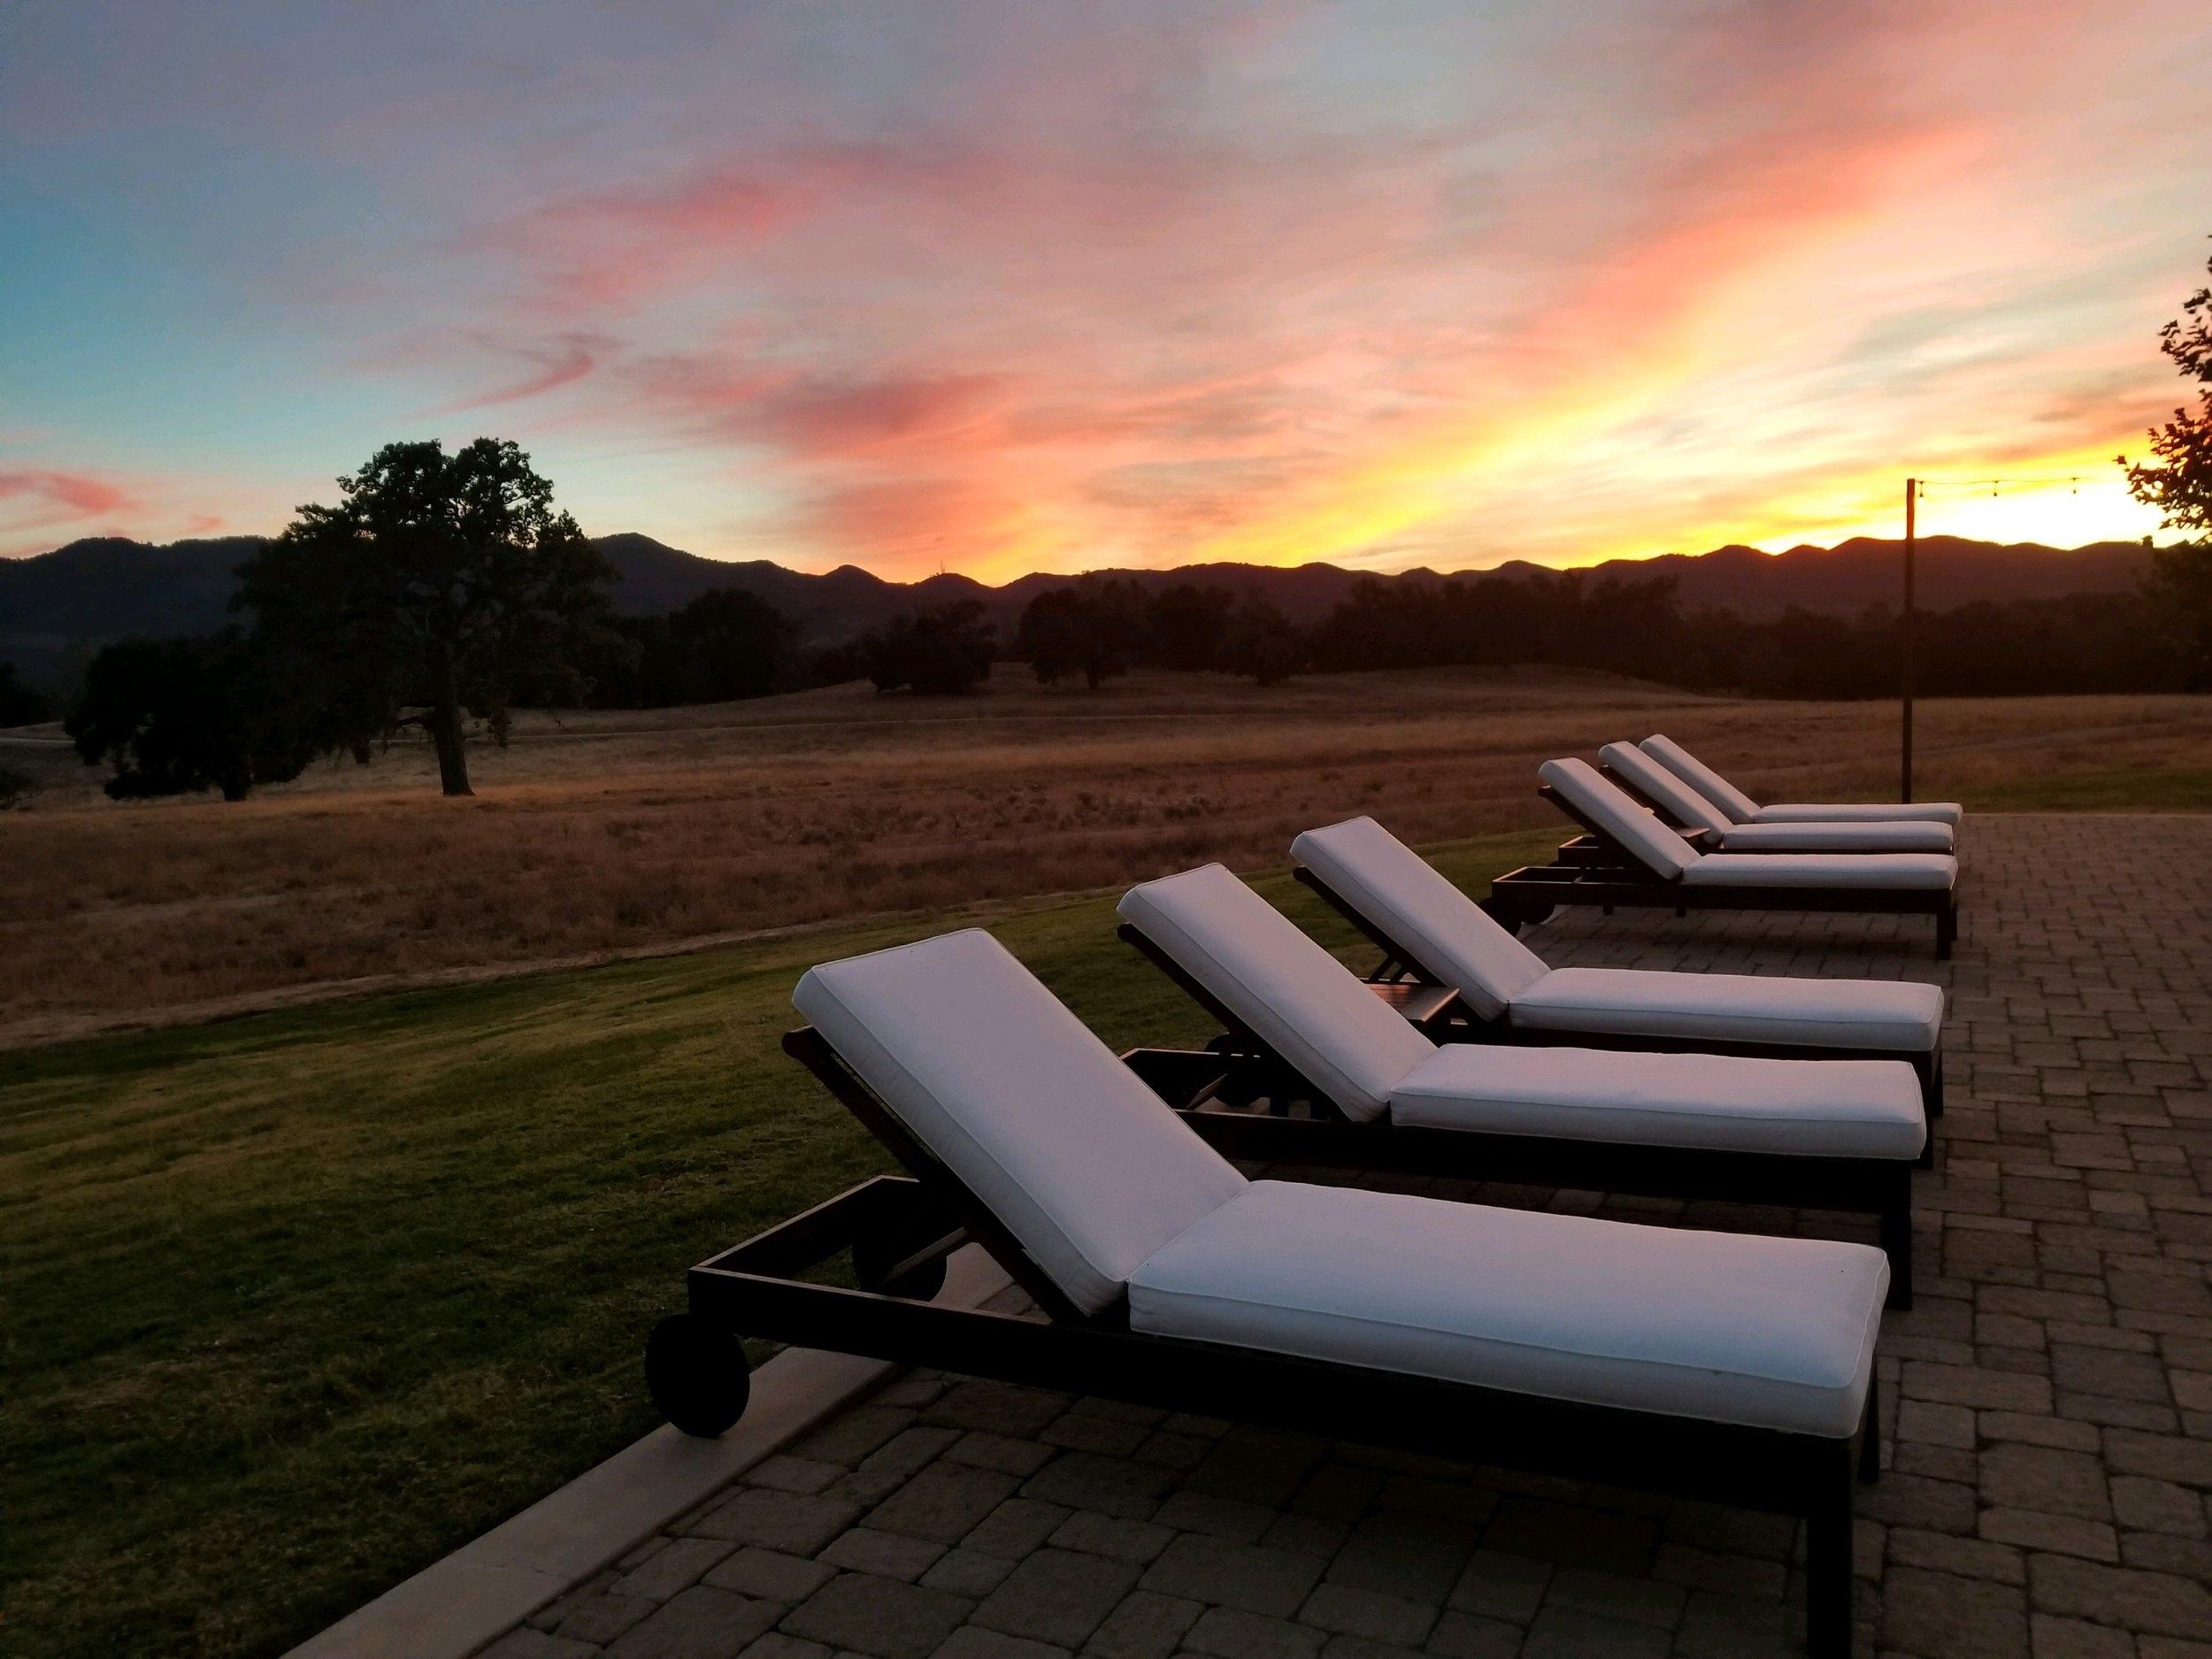 Riata Ranch Sunset 1 10.28.18 (1).jpg